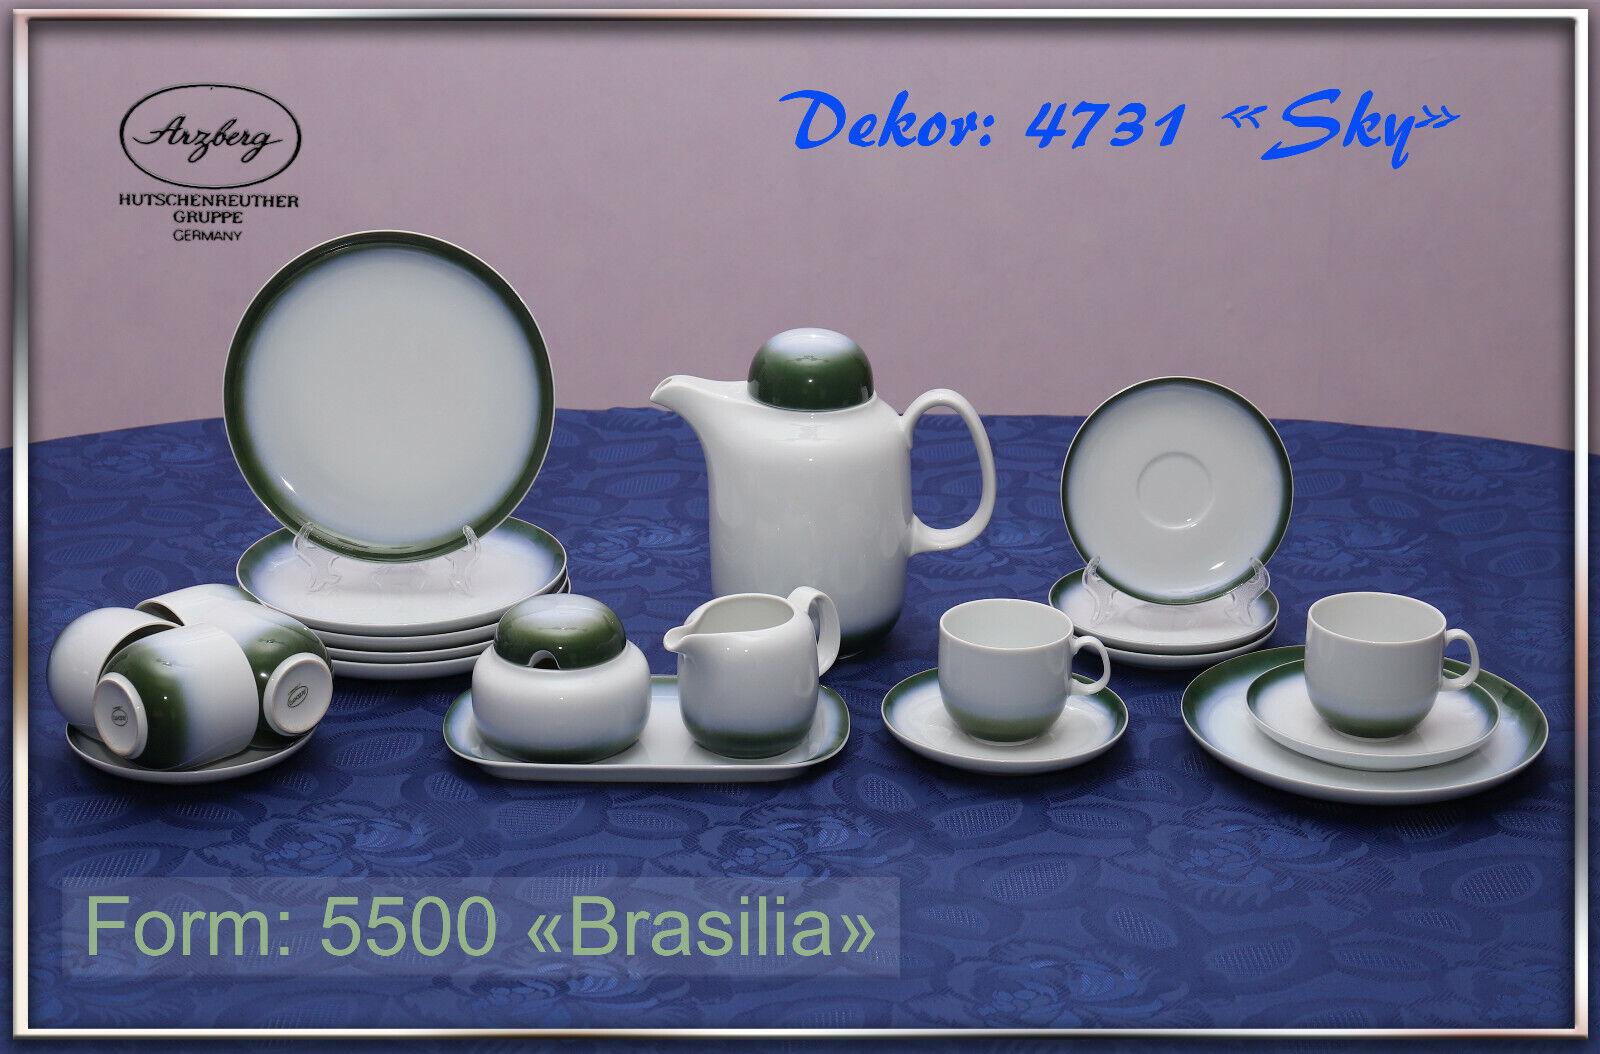 Kaffeeservice 6Pers. Arzberg Form 5500 Brasilia Brasilia Brasilia Dekor 4731 Sky Hutschenreuther a56375